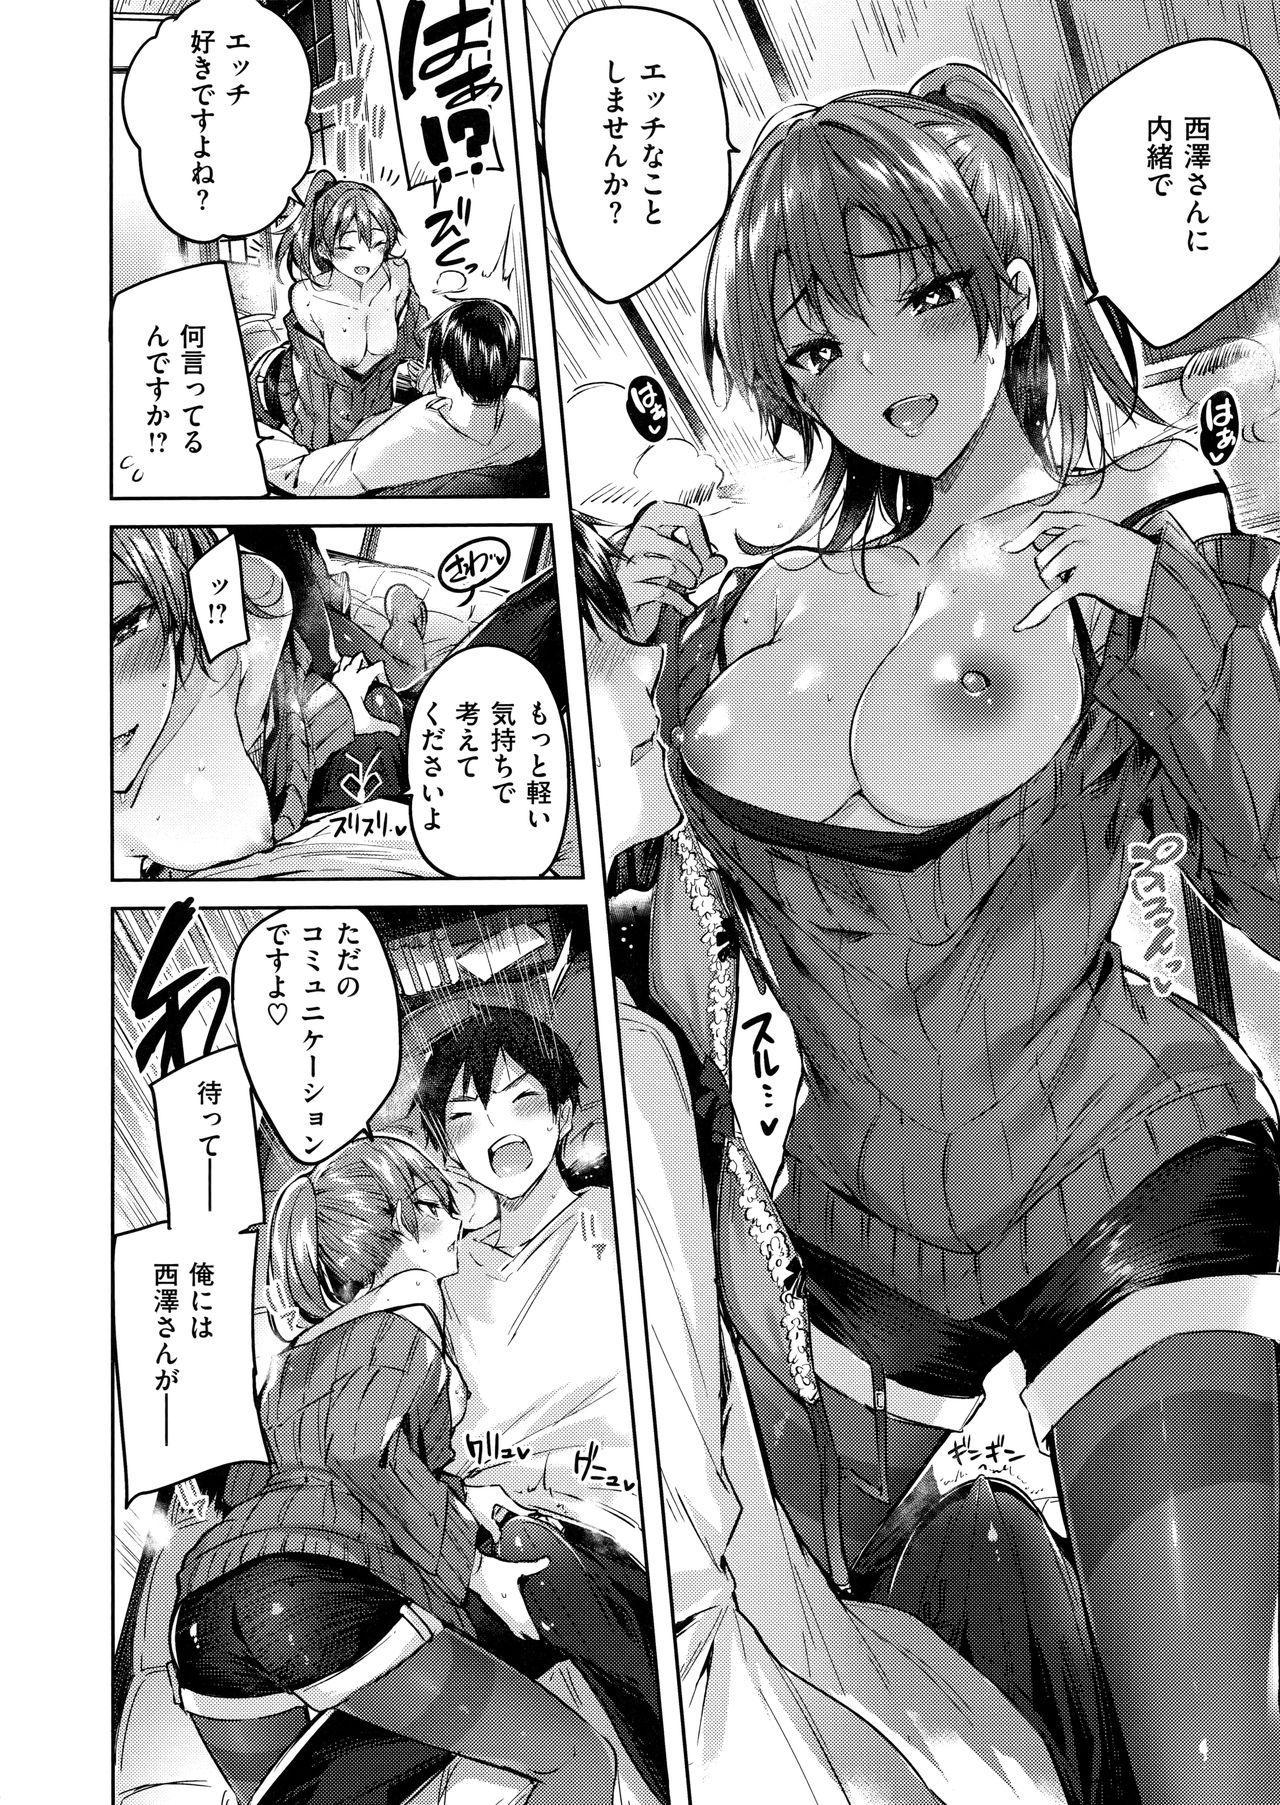 Nakadashi Strike! - Winning strike! 91